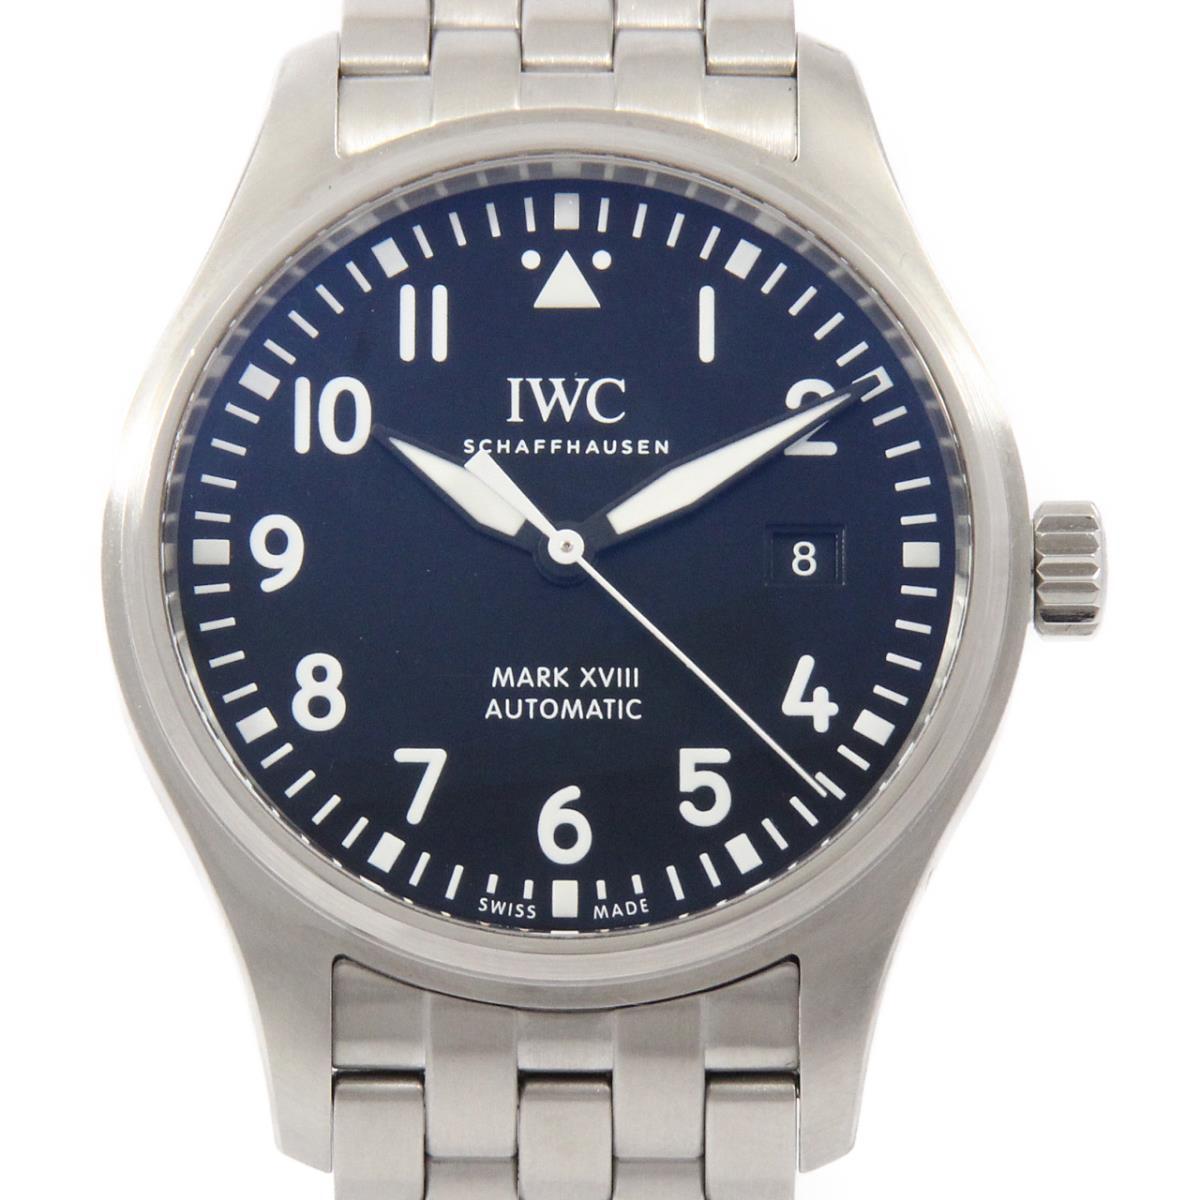 IWC IW327011 パイロットウォッチ・マークXVIII 自動巻【中古】